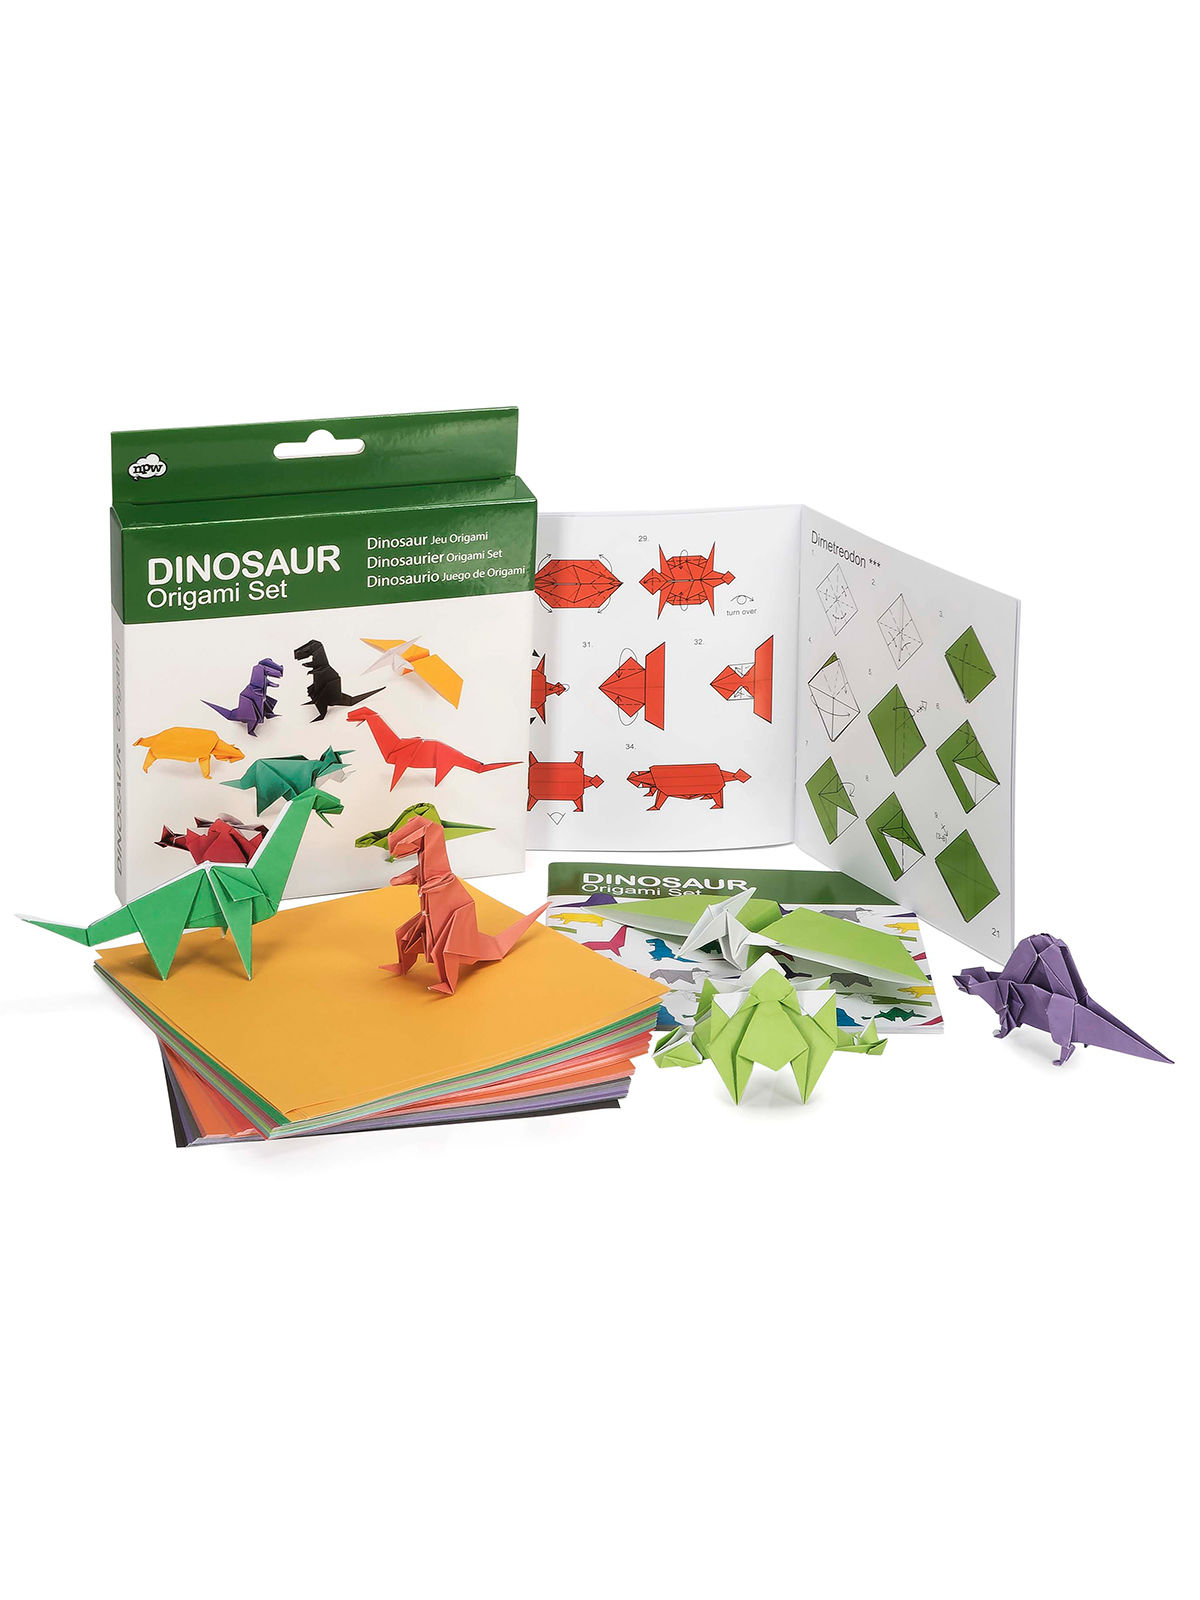 Dinosaurio origami interesting origami de dinosaurio with finest origami set dinosaurier bastelset teilig bunt gnstige origami set dinosaurier bastelset teilig bunt jeuxipadfo with dinosaurio origami jeuxipadfo Choice Image